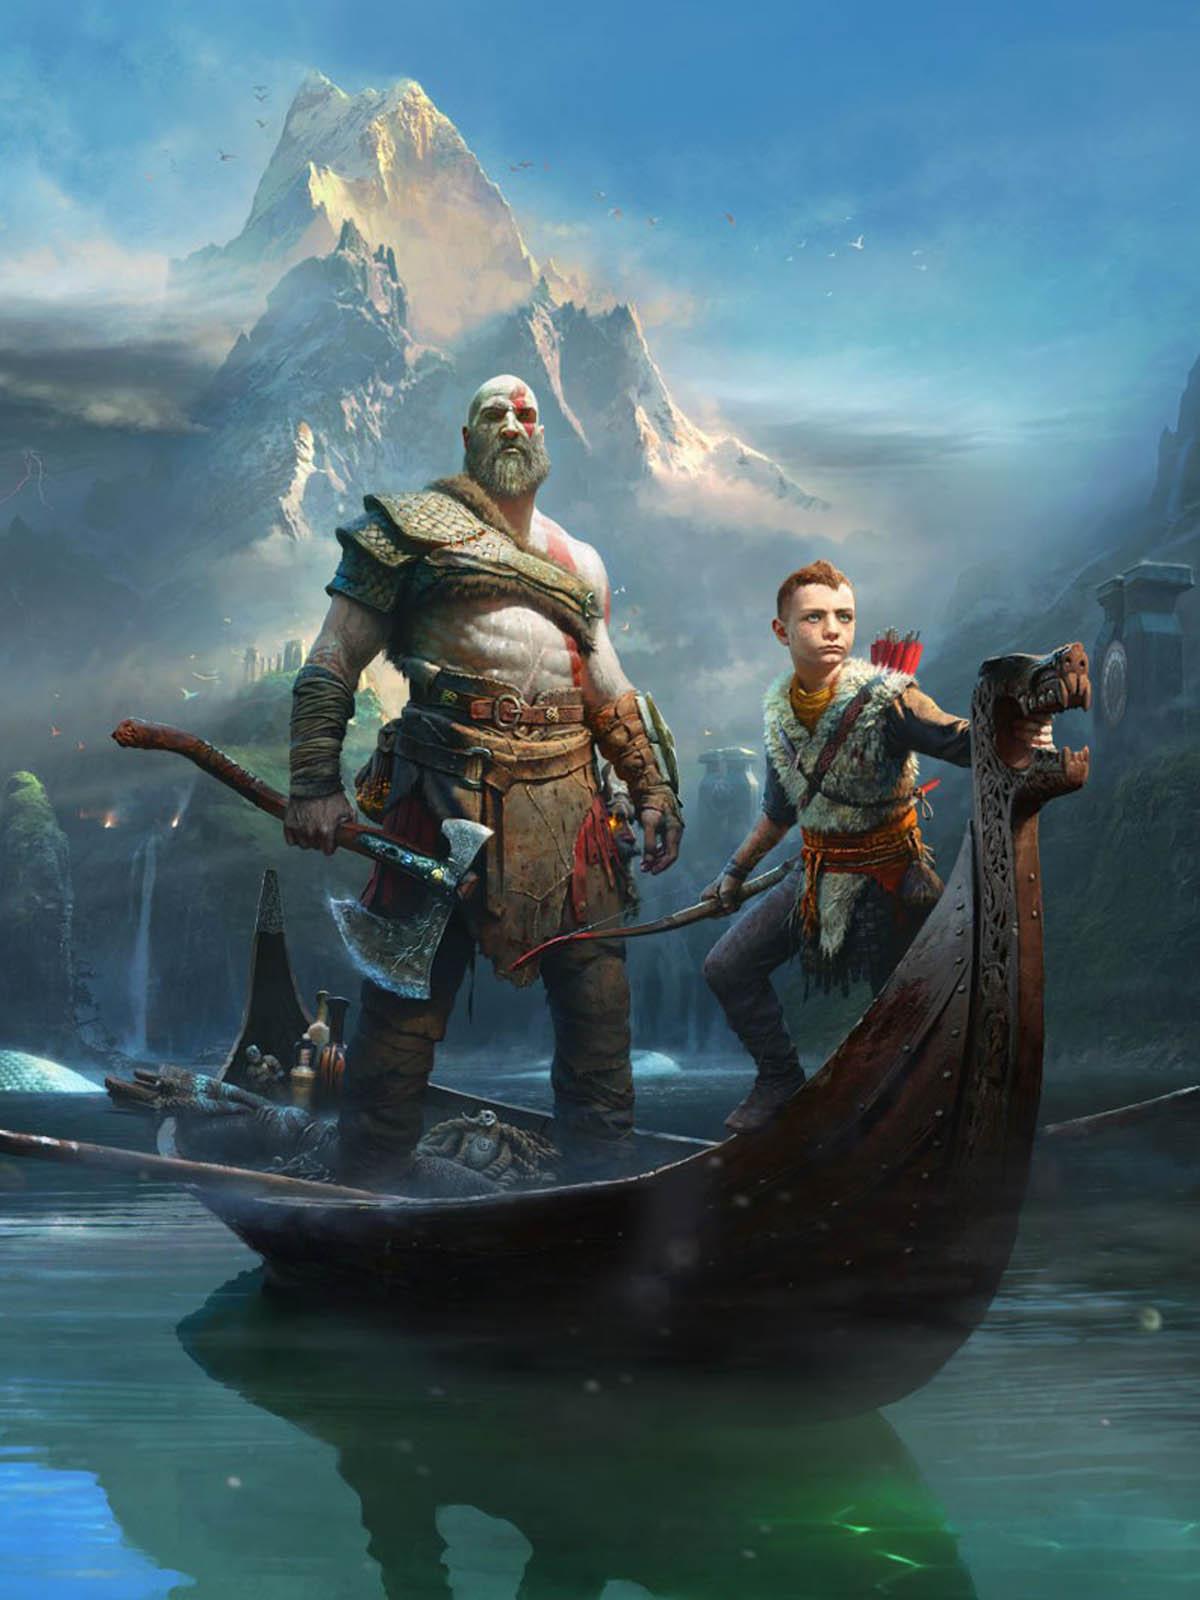 God Of War Kratos And Atreus Free 4k Ultra Hd Mobile Wallpaper